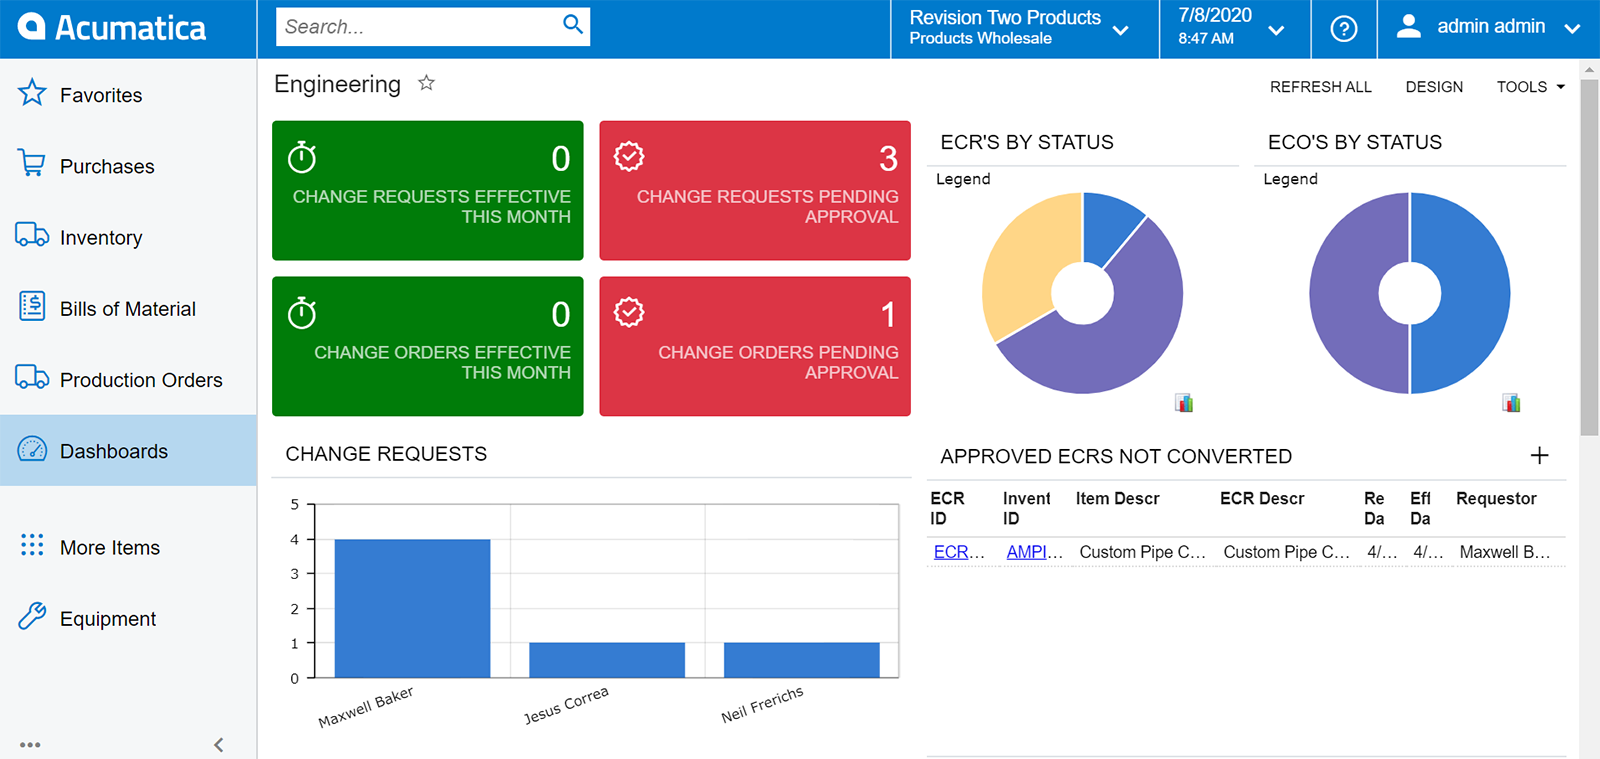 Acumatica Cloud ERP Software - 2